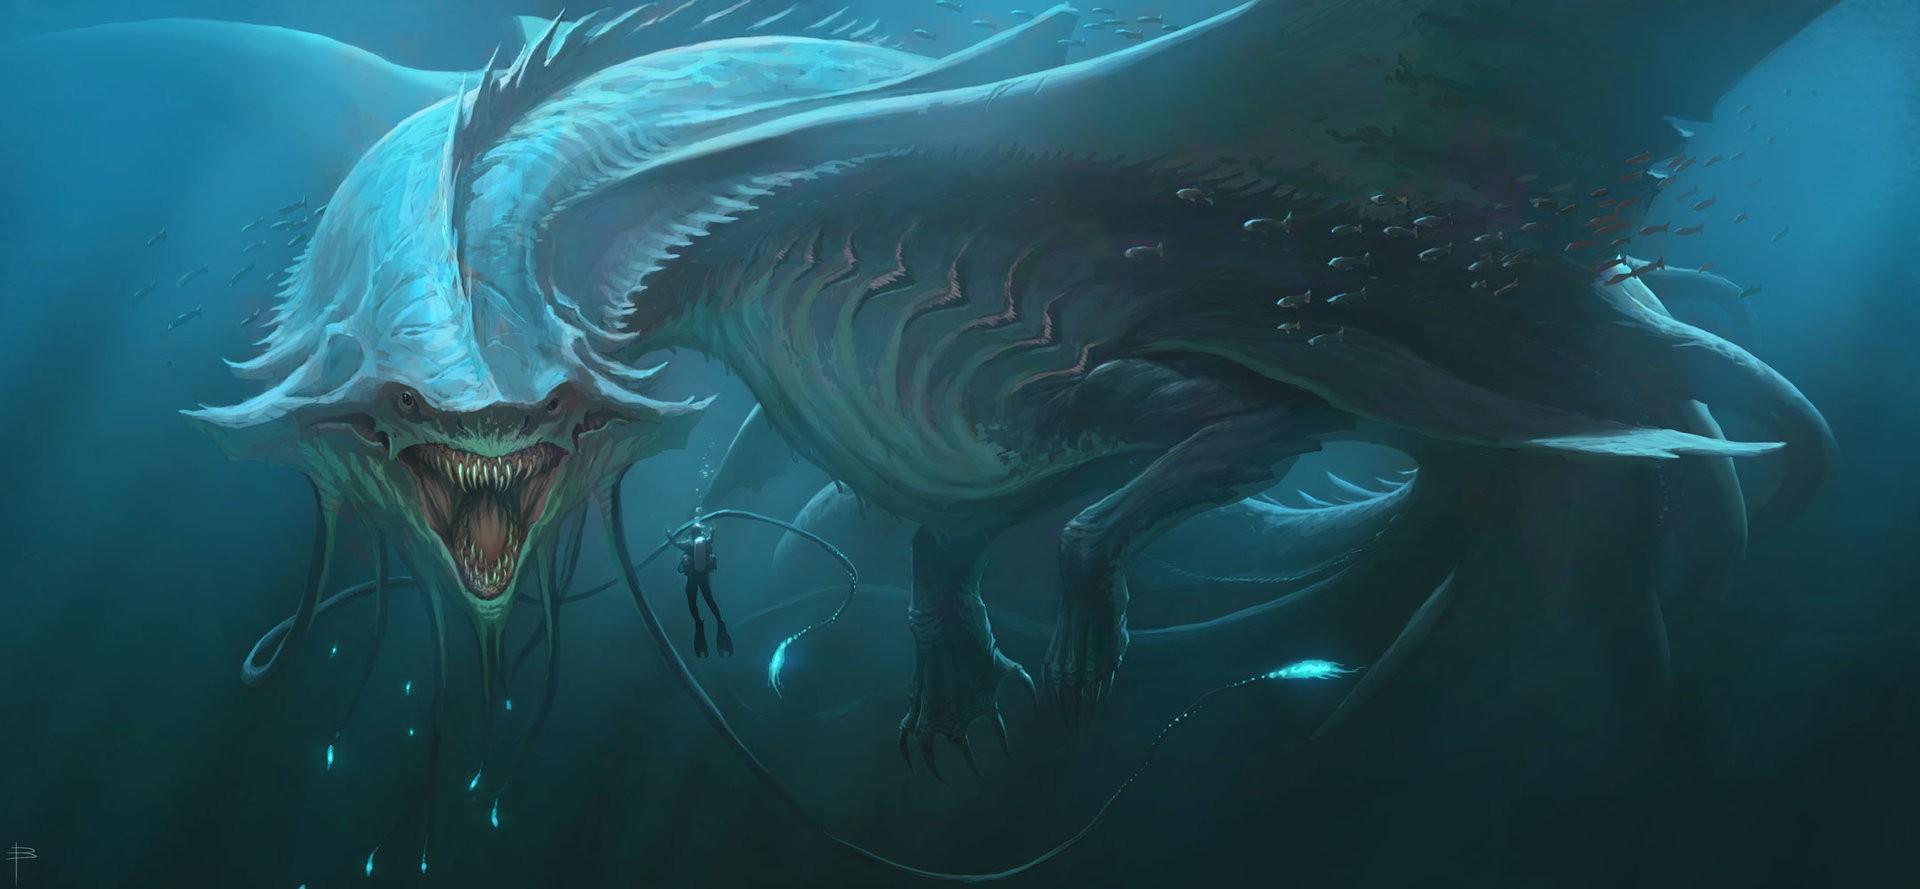 Fantasy water creatures - photo#25